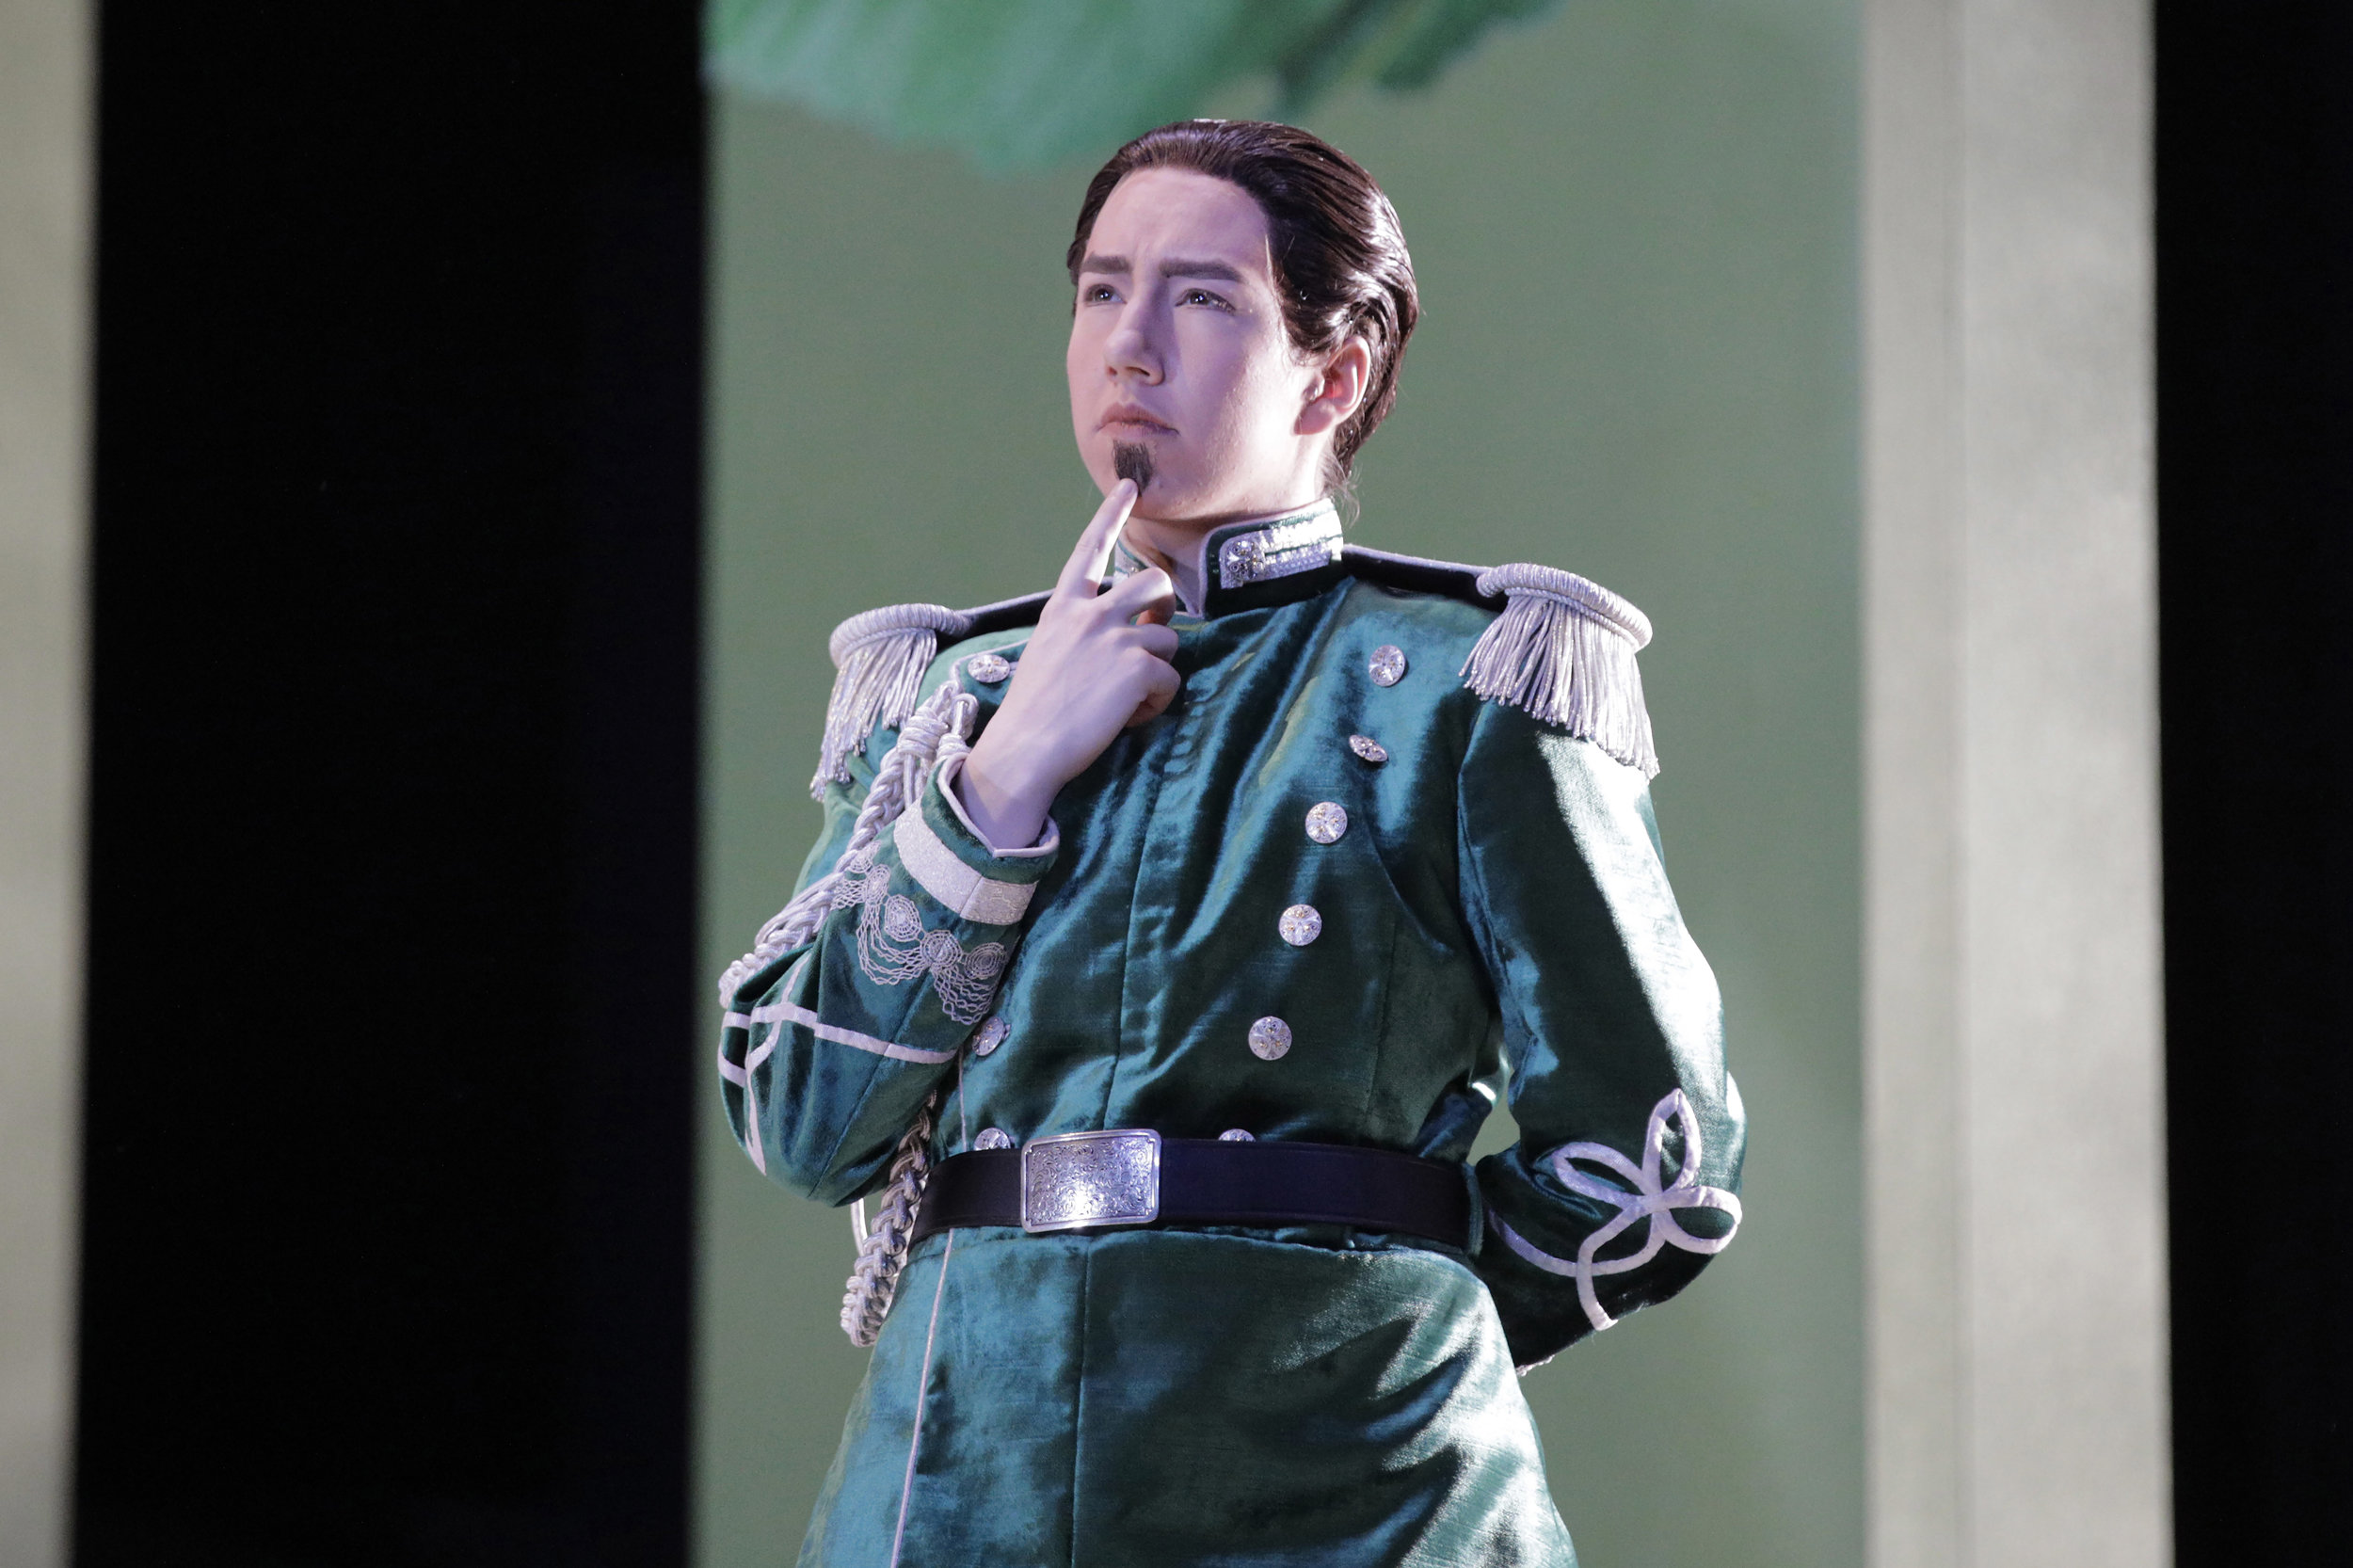 La Finta Giardiniera Portland Opera Directed by Chas Rader-Shieber Photo by Cory Weaver